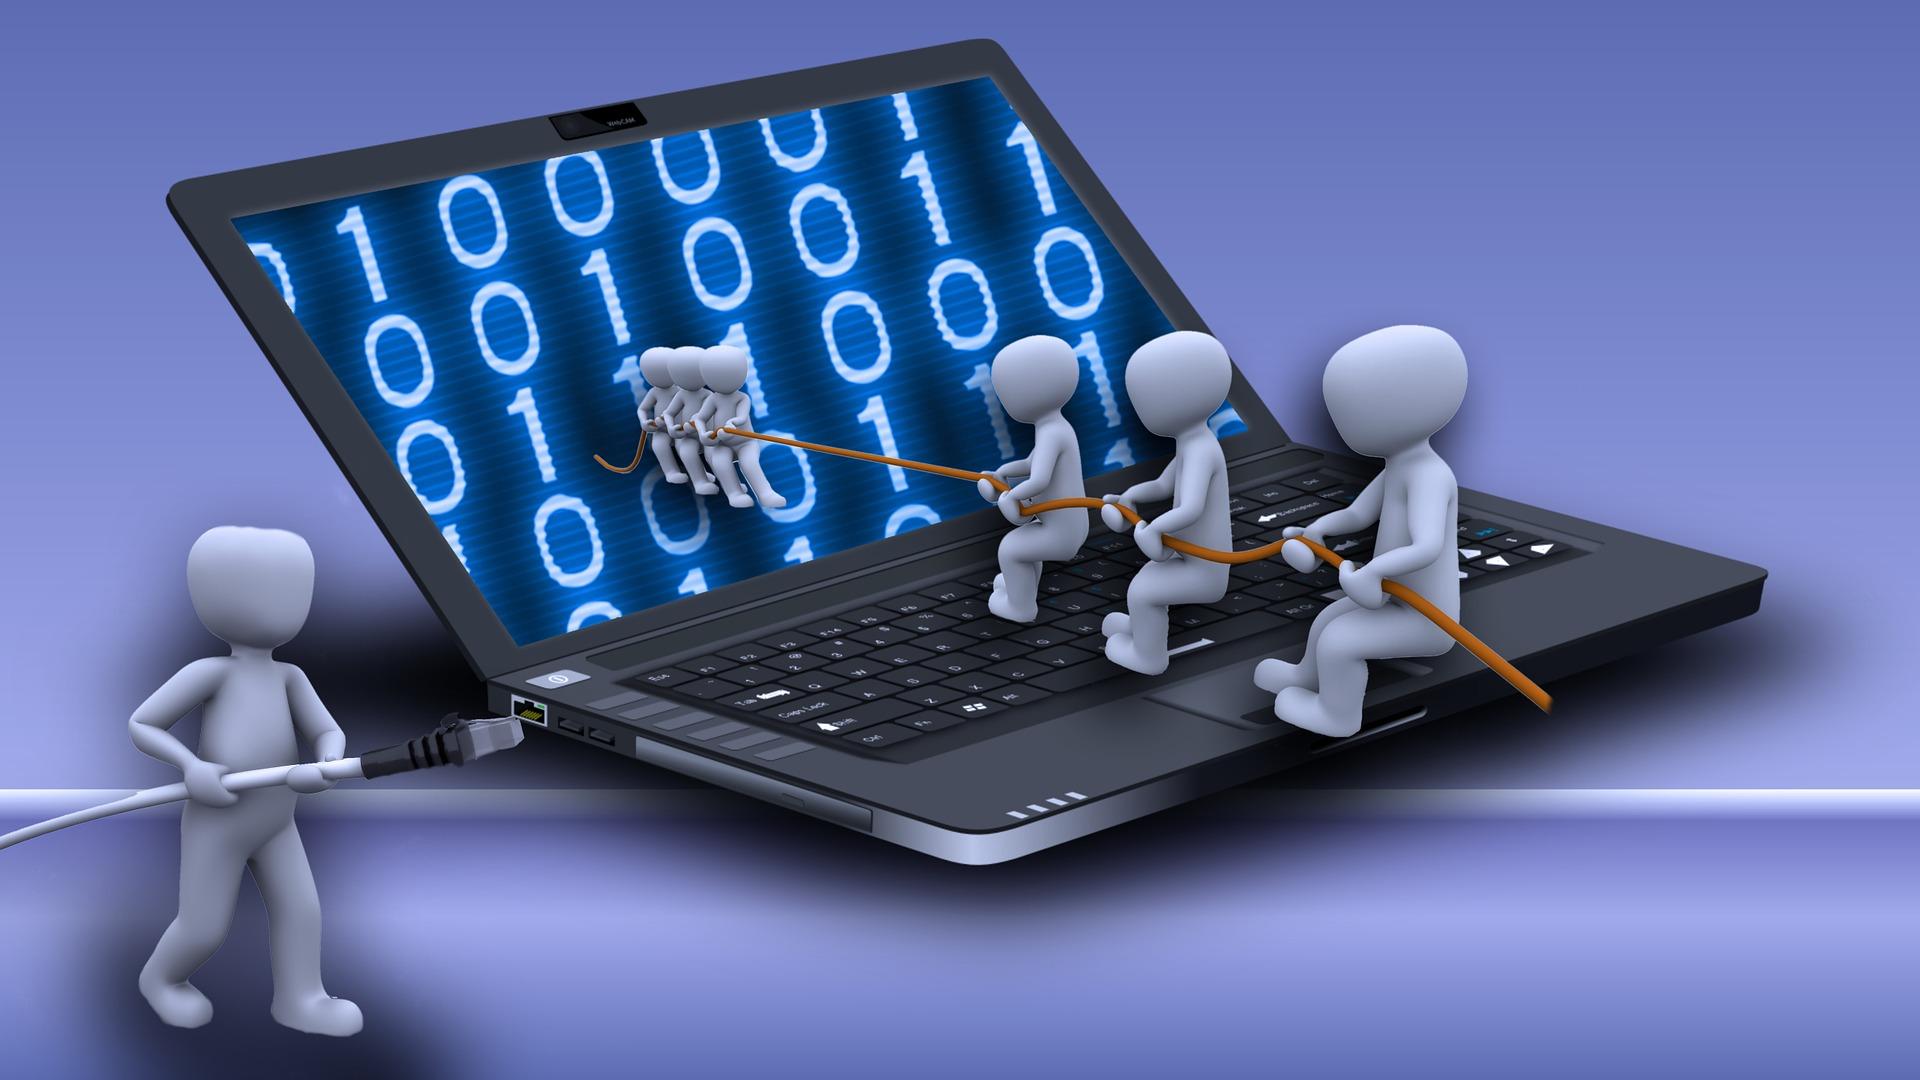 laptop-1104066_1920.jpg